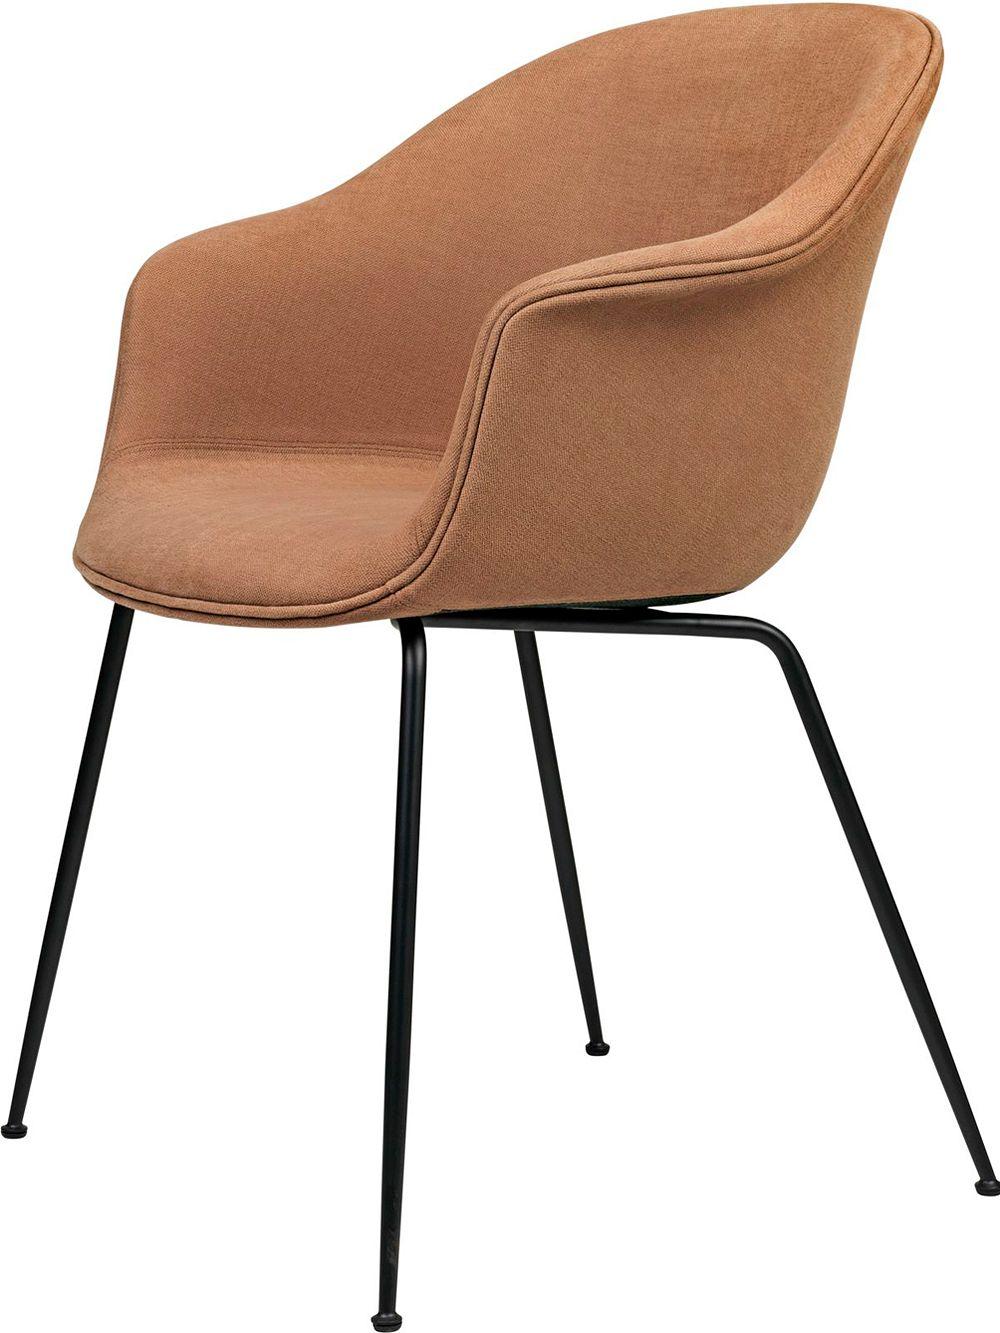 Gubi Bat chair